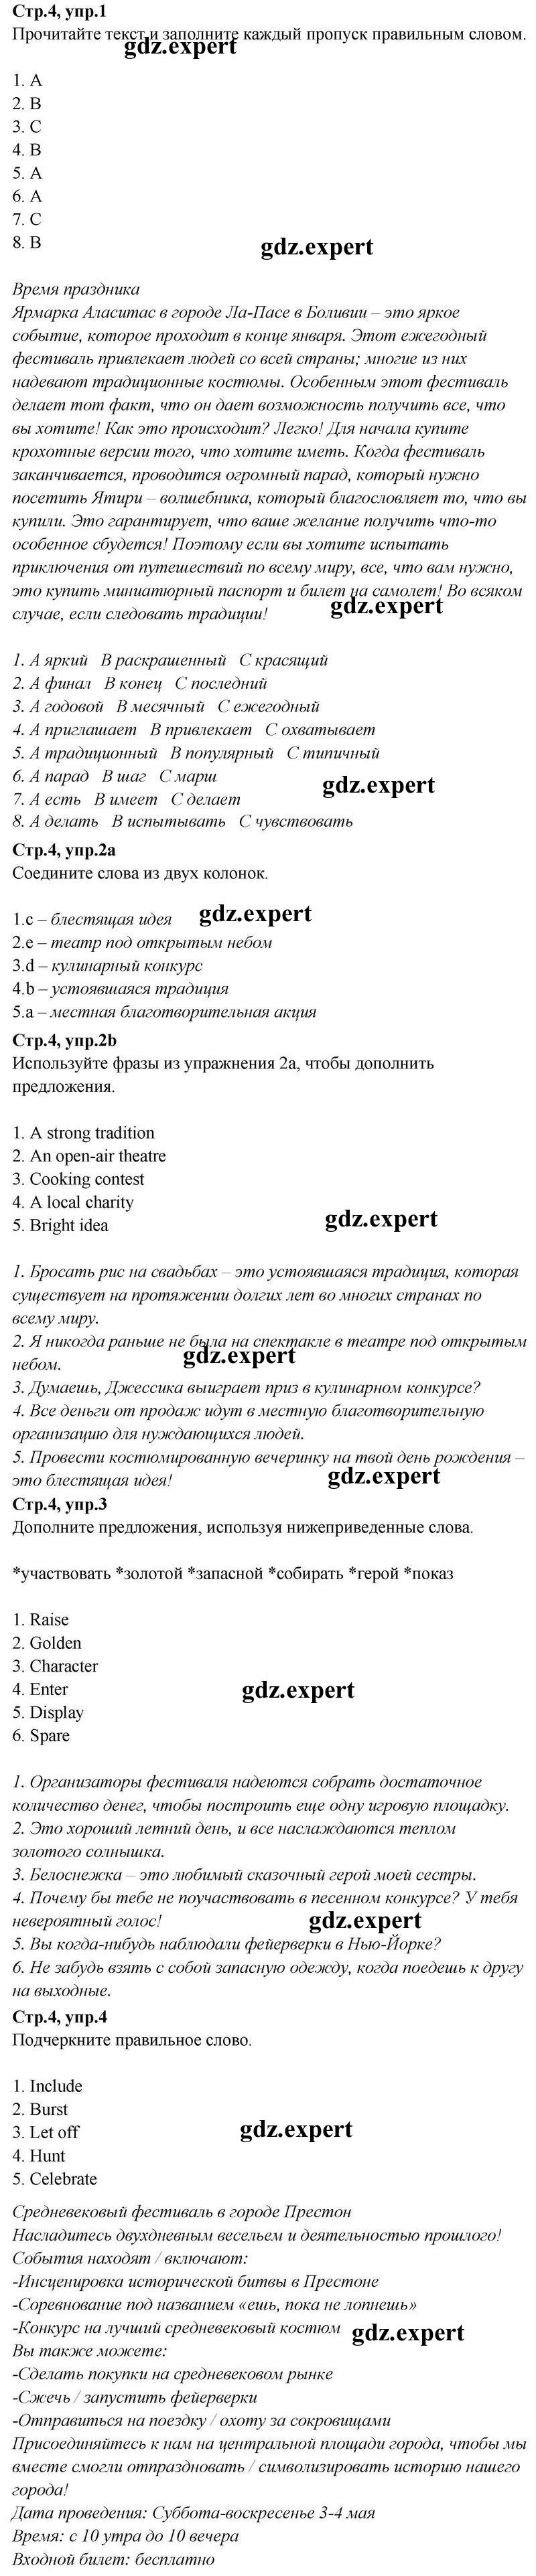 стр. 4 - решебник №1